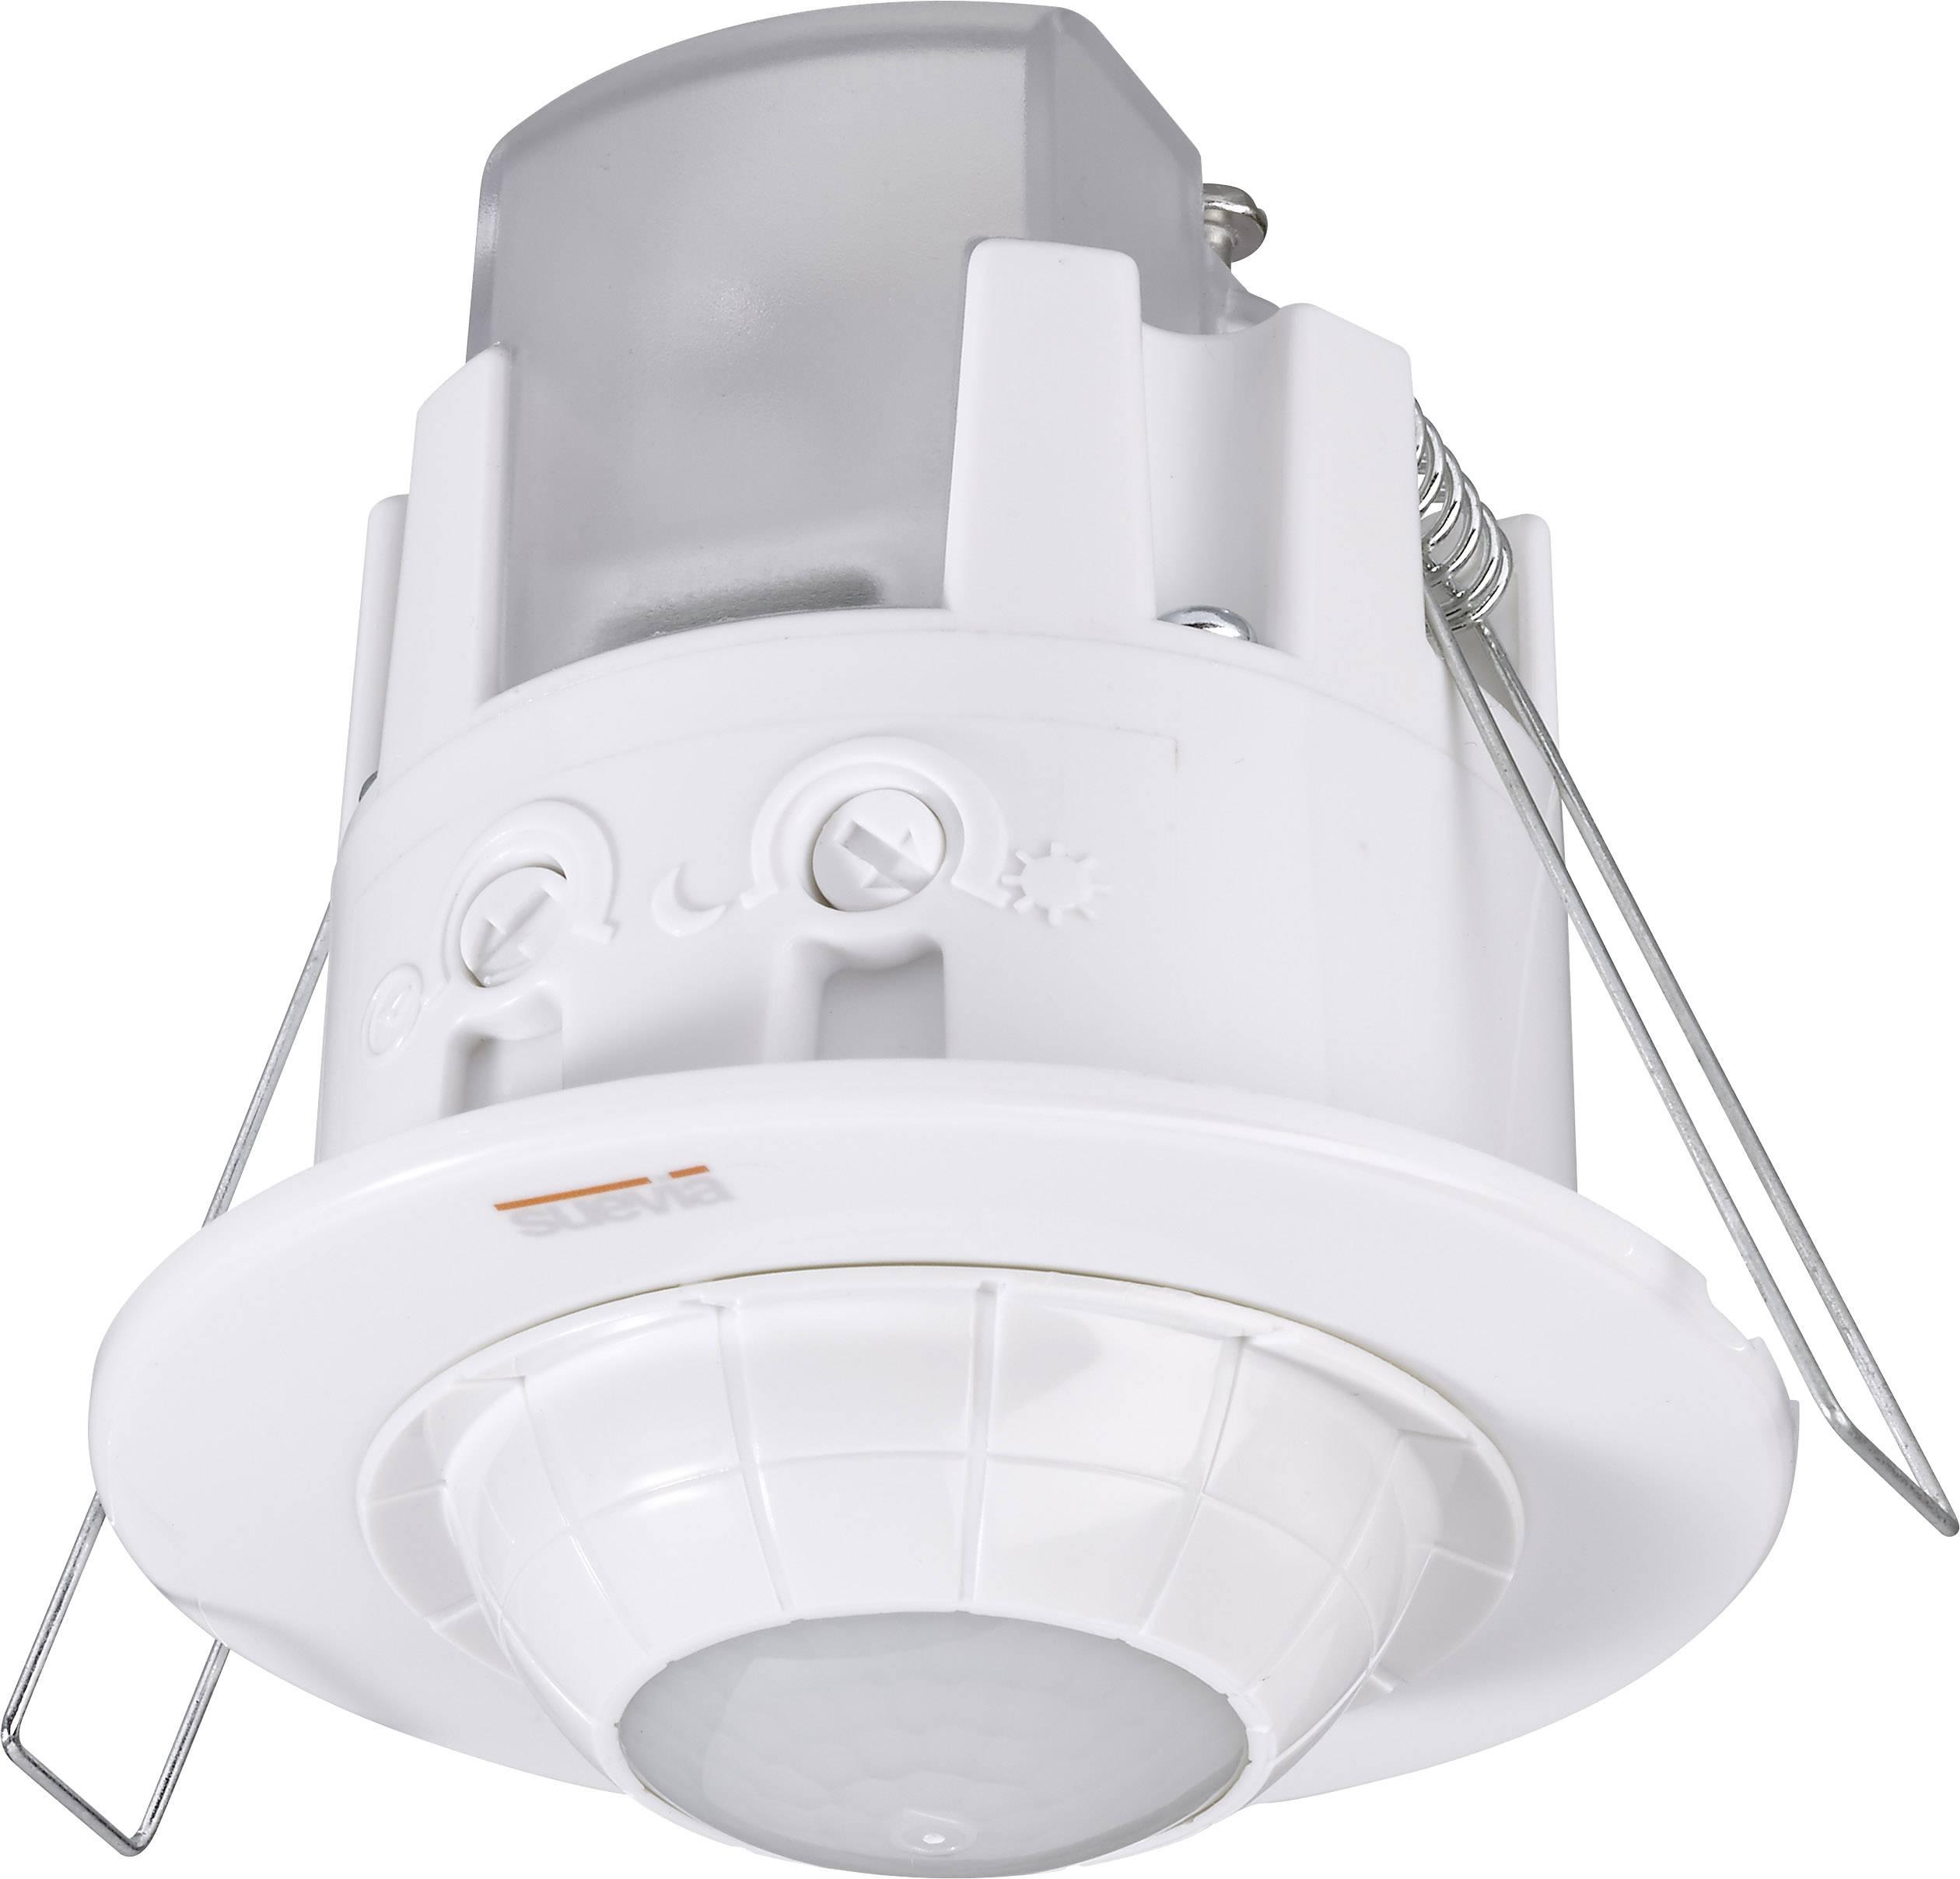 Detektor pohybu Suevia SU136012, 360 °, bílá, IP20